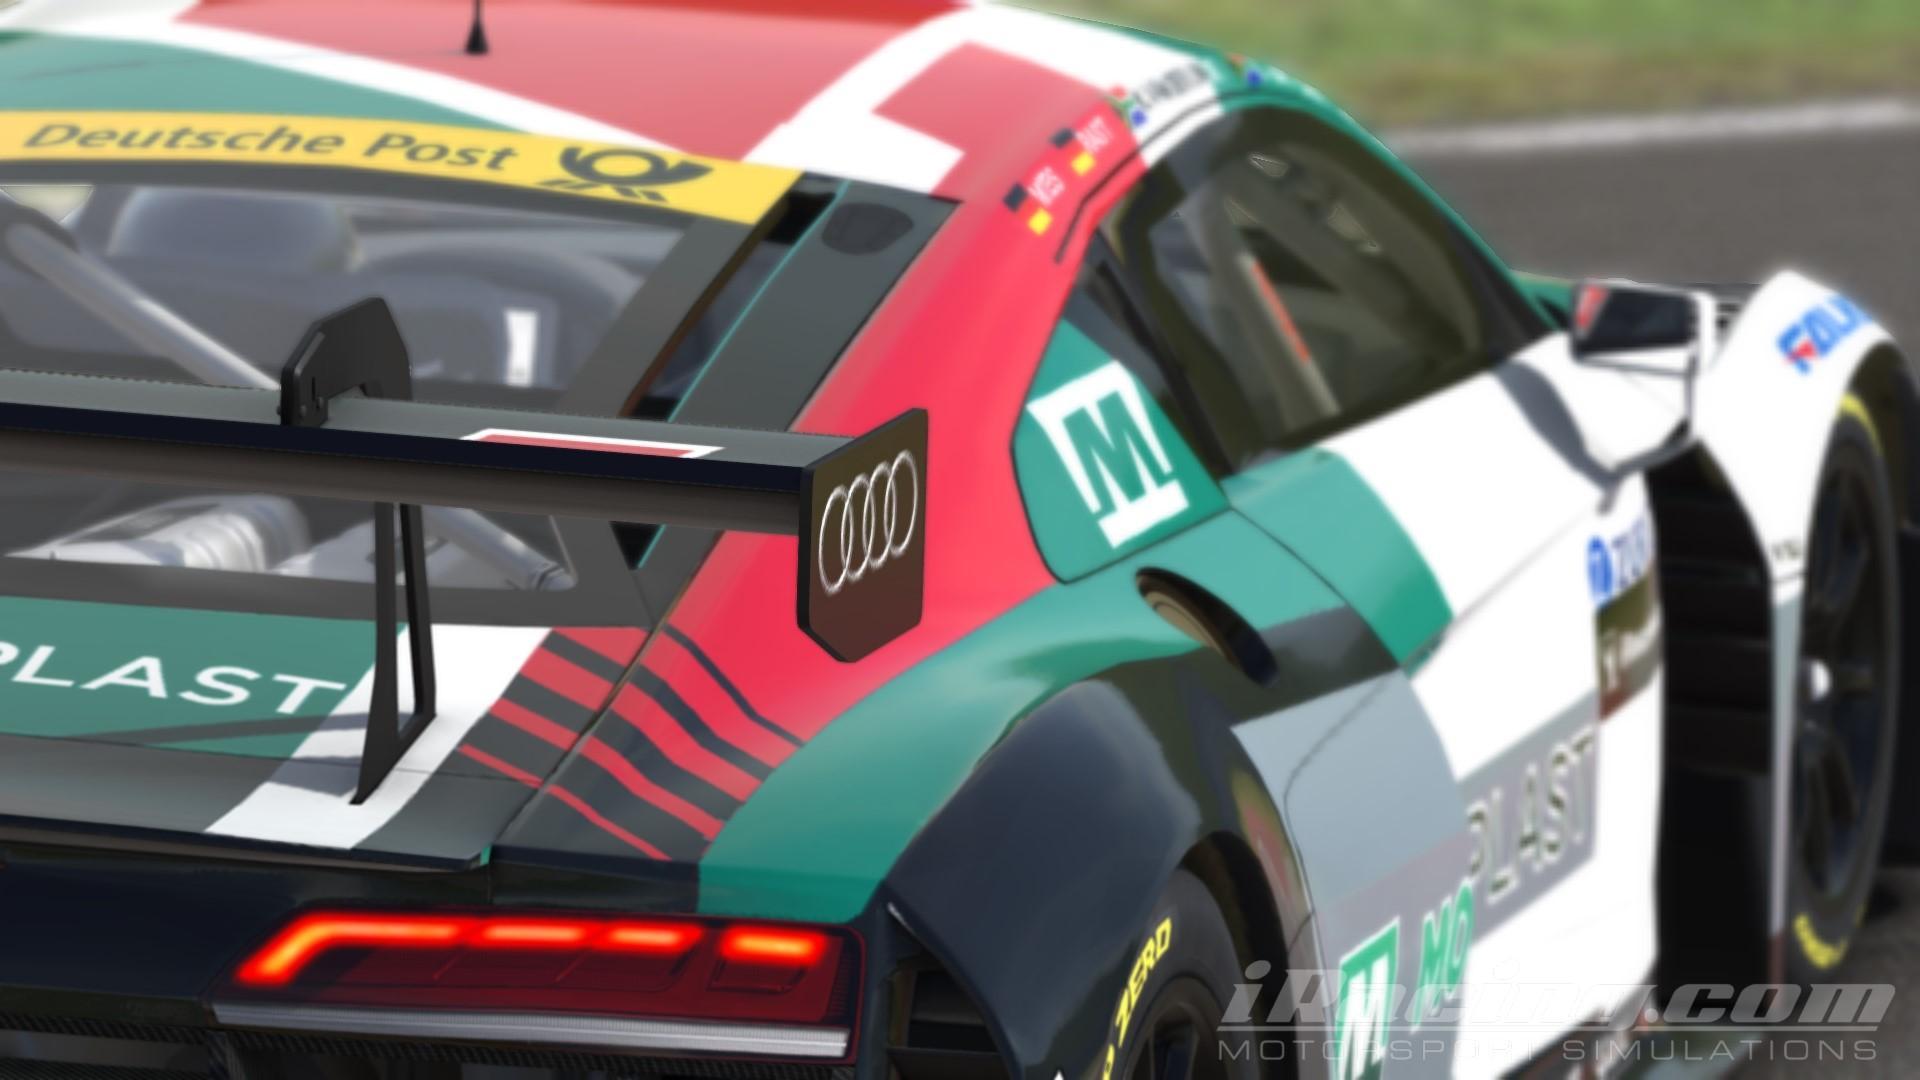 Preview of Land Motorsport - 24h Nürburgring 2018 by Christian Haas